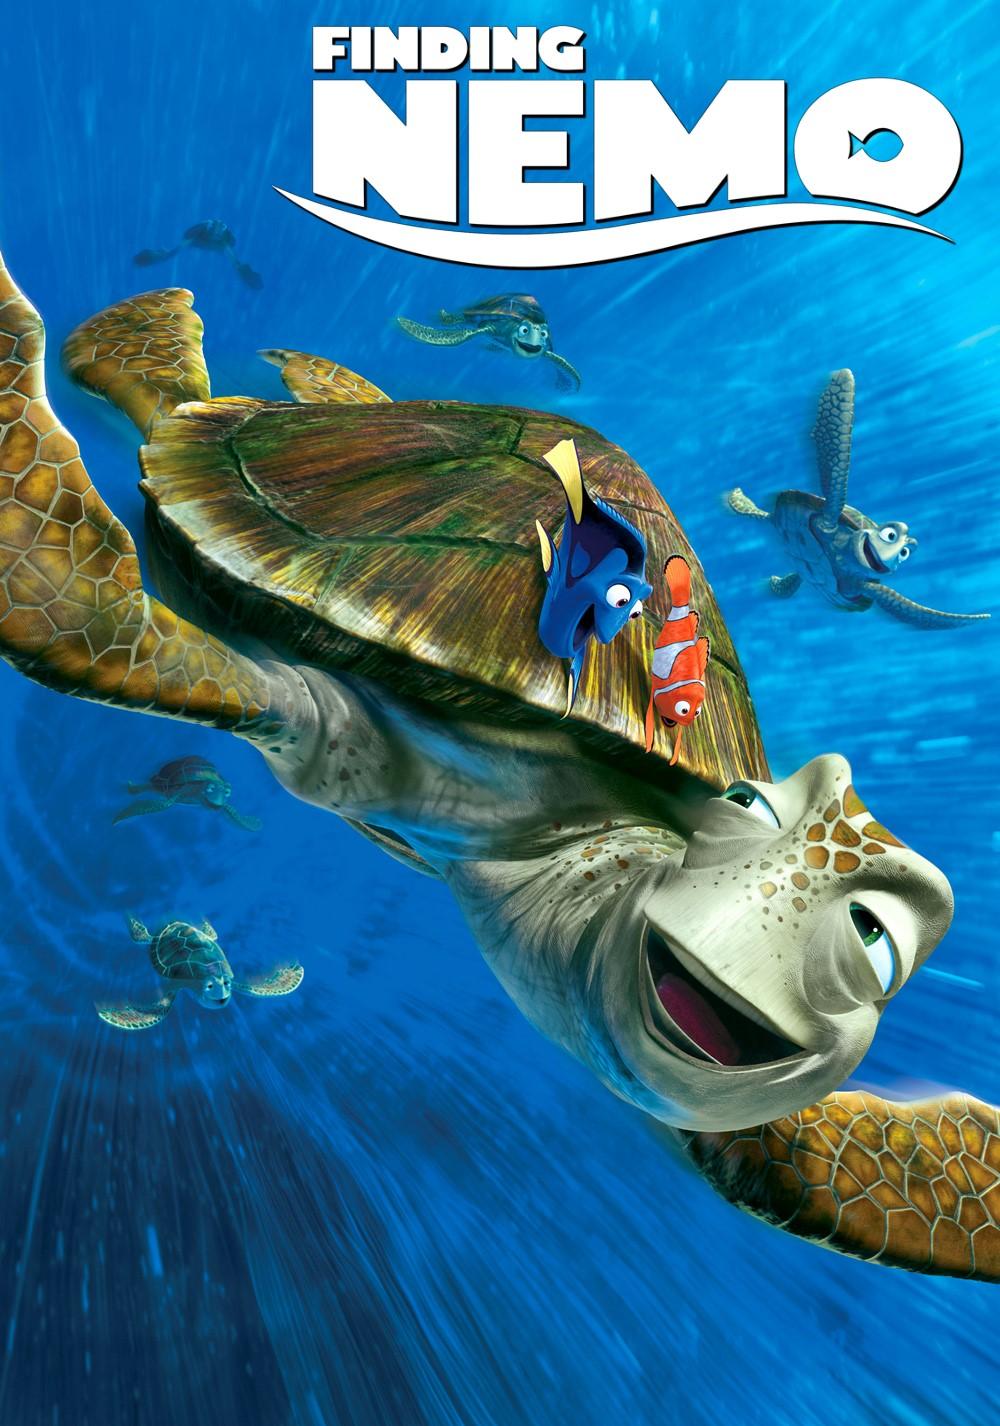 Finding Nemo - IMDb